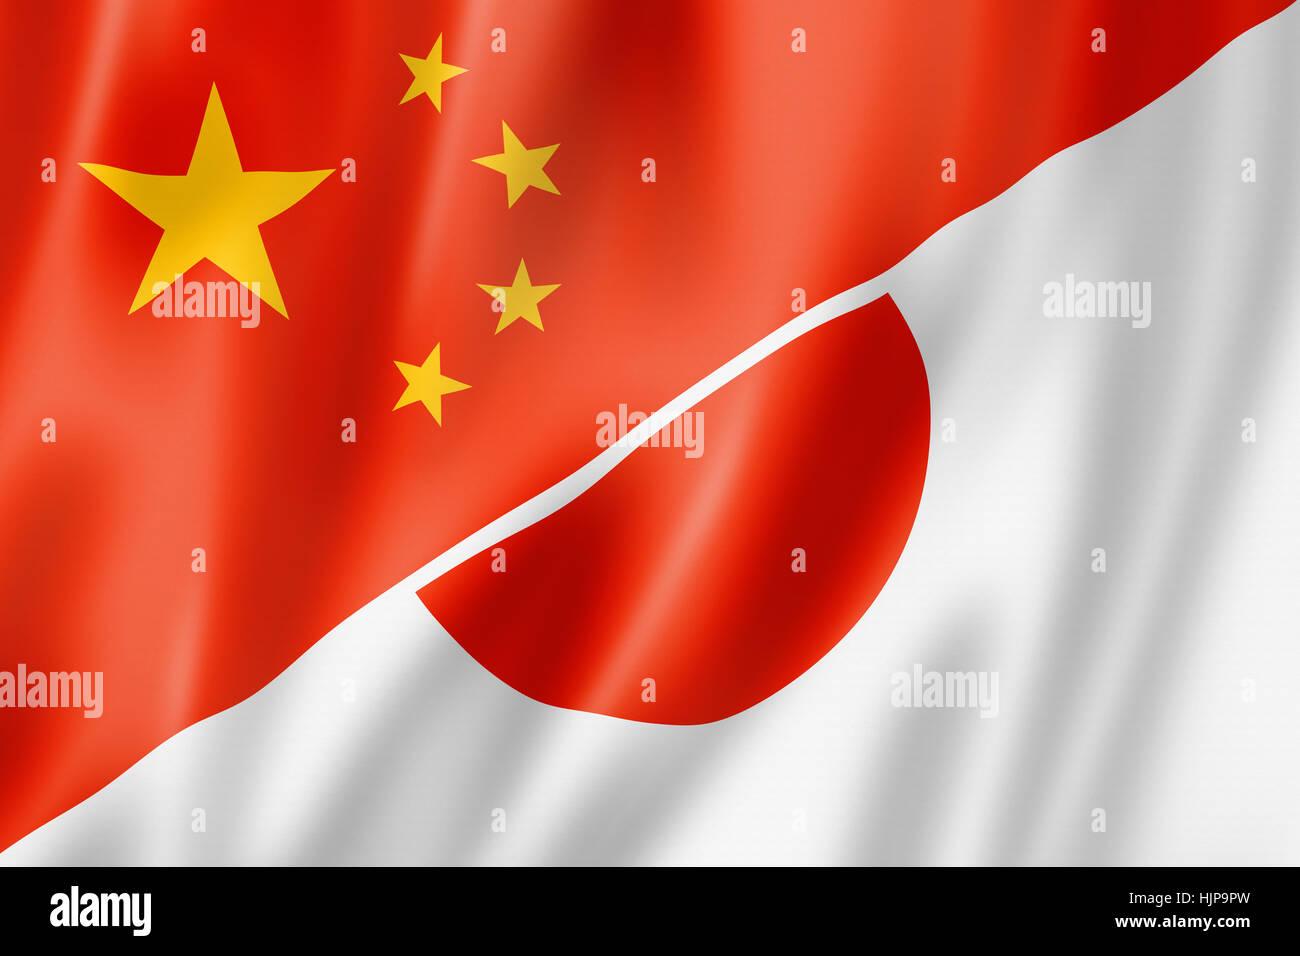 Japanese Flag Design Stock Photos Amp Japanese Flag Design